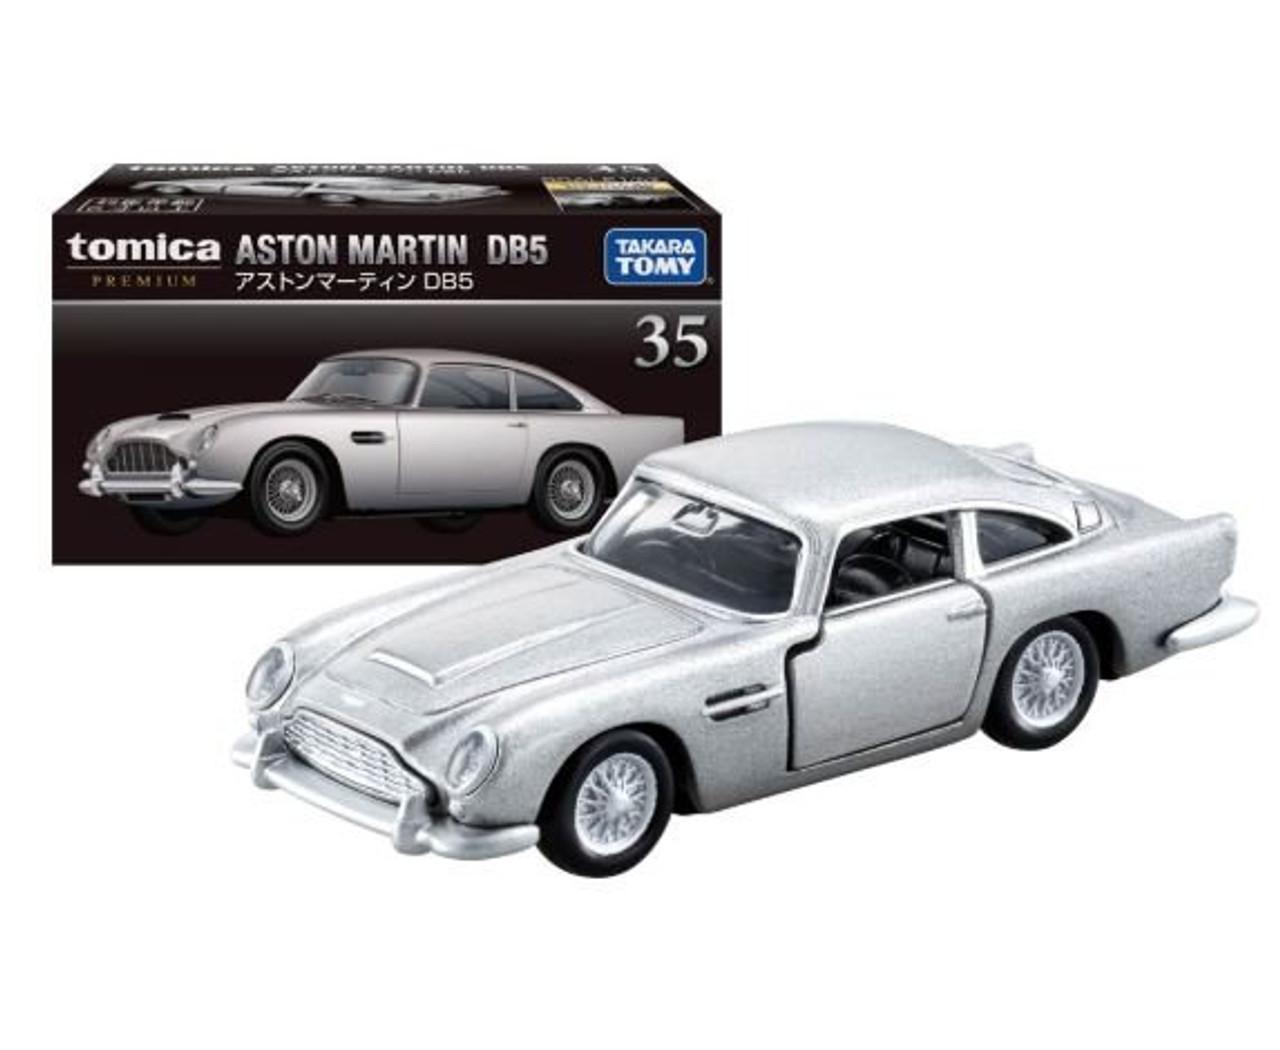 Takara Tomy Tomica Premium No 35 Aston Martin Db5 Diecast Toy Car Buymarket Store